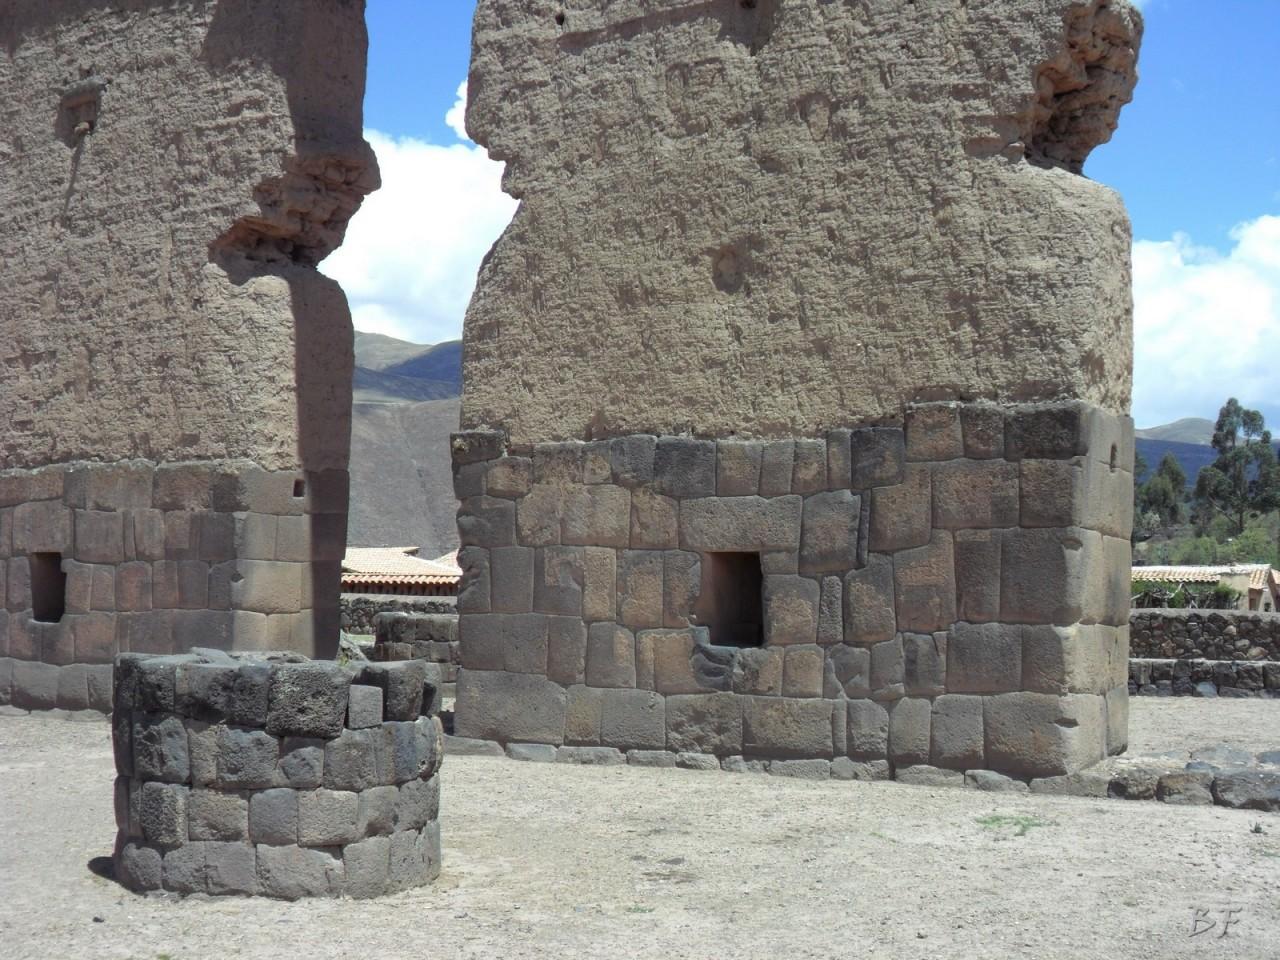 Tempio-di-Viracocha-Megaliti-San-Pedro-Cusco-Perù-23